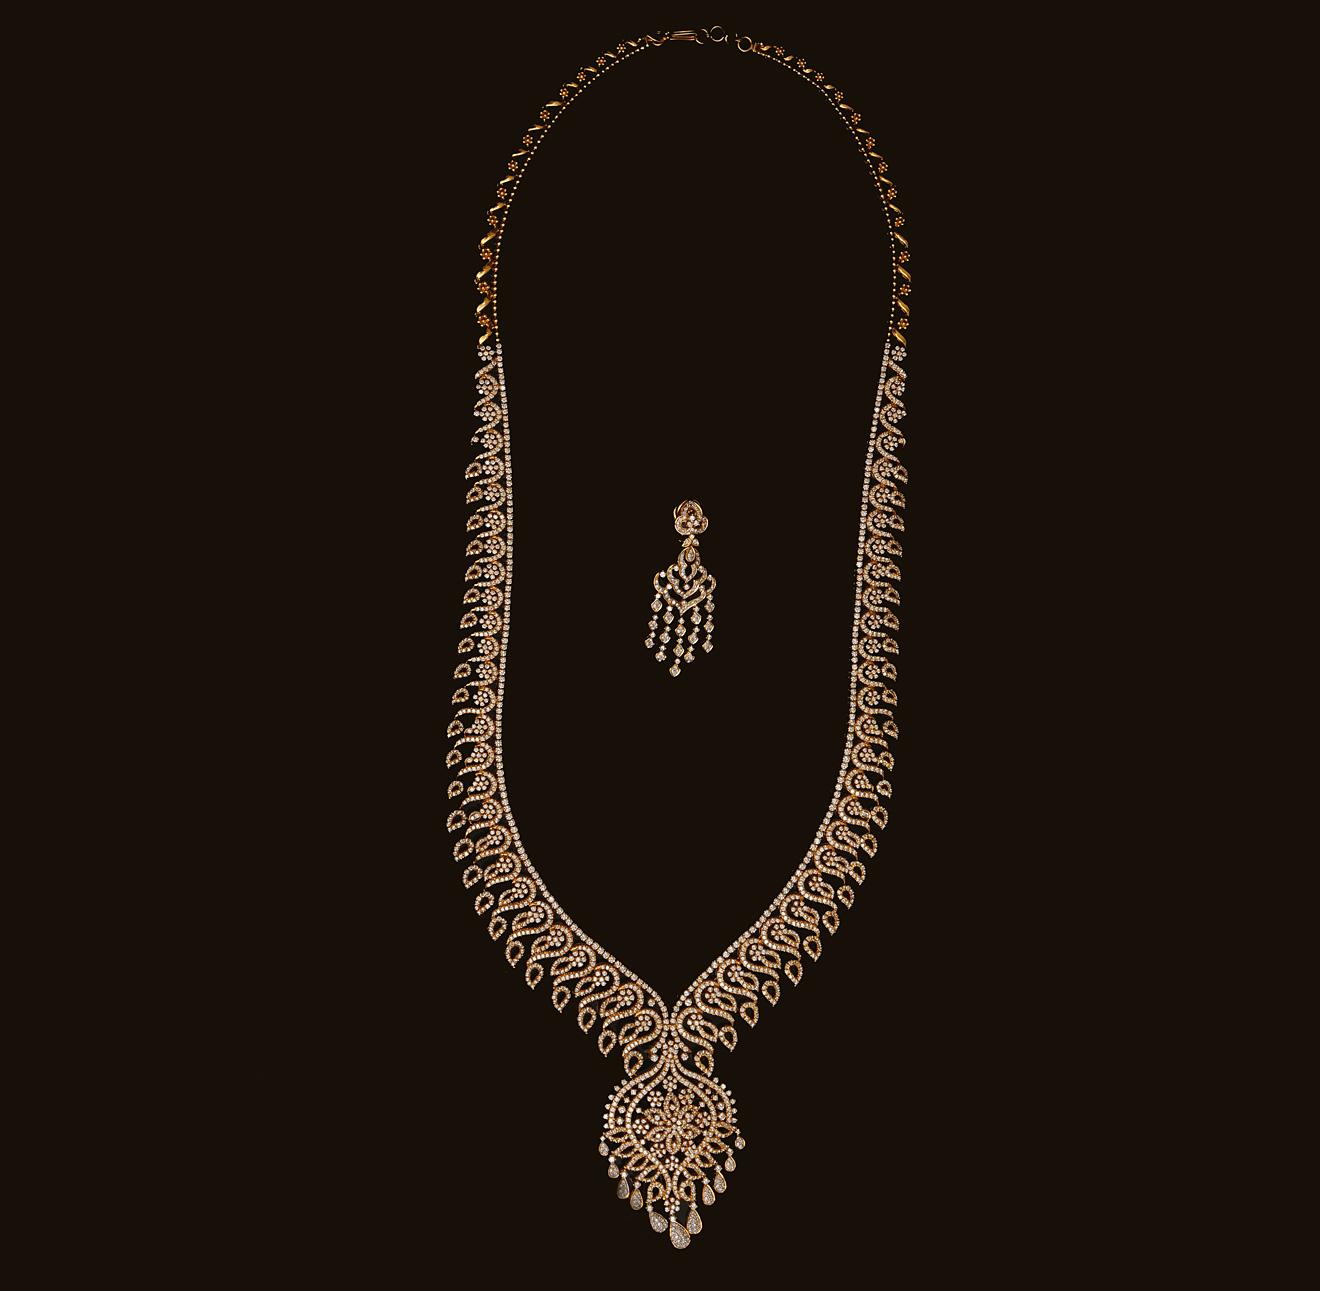 Bridal Diamond Necklace And Haram Set: Gold And Diamond Jewellery Designs: Indian Diamond Bridal